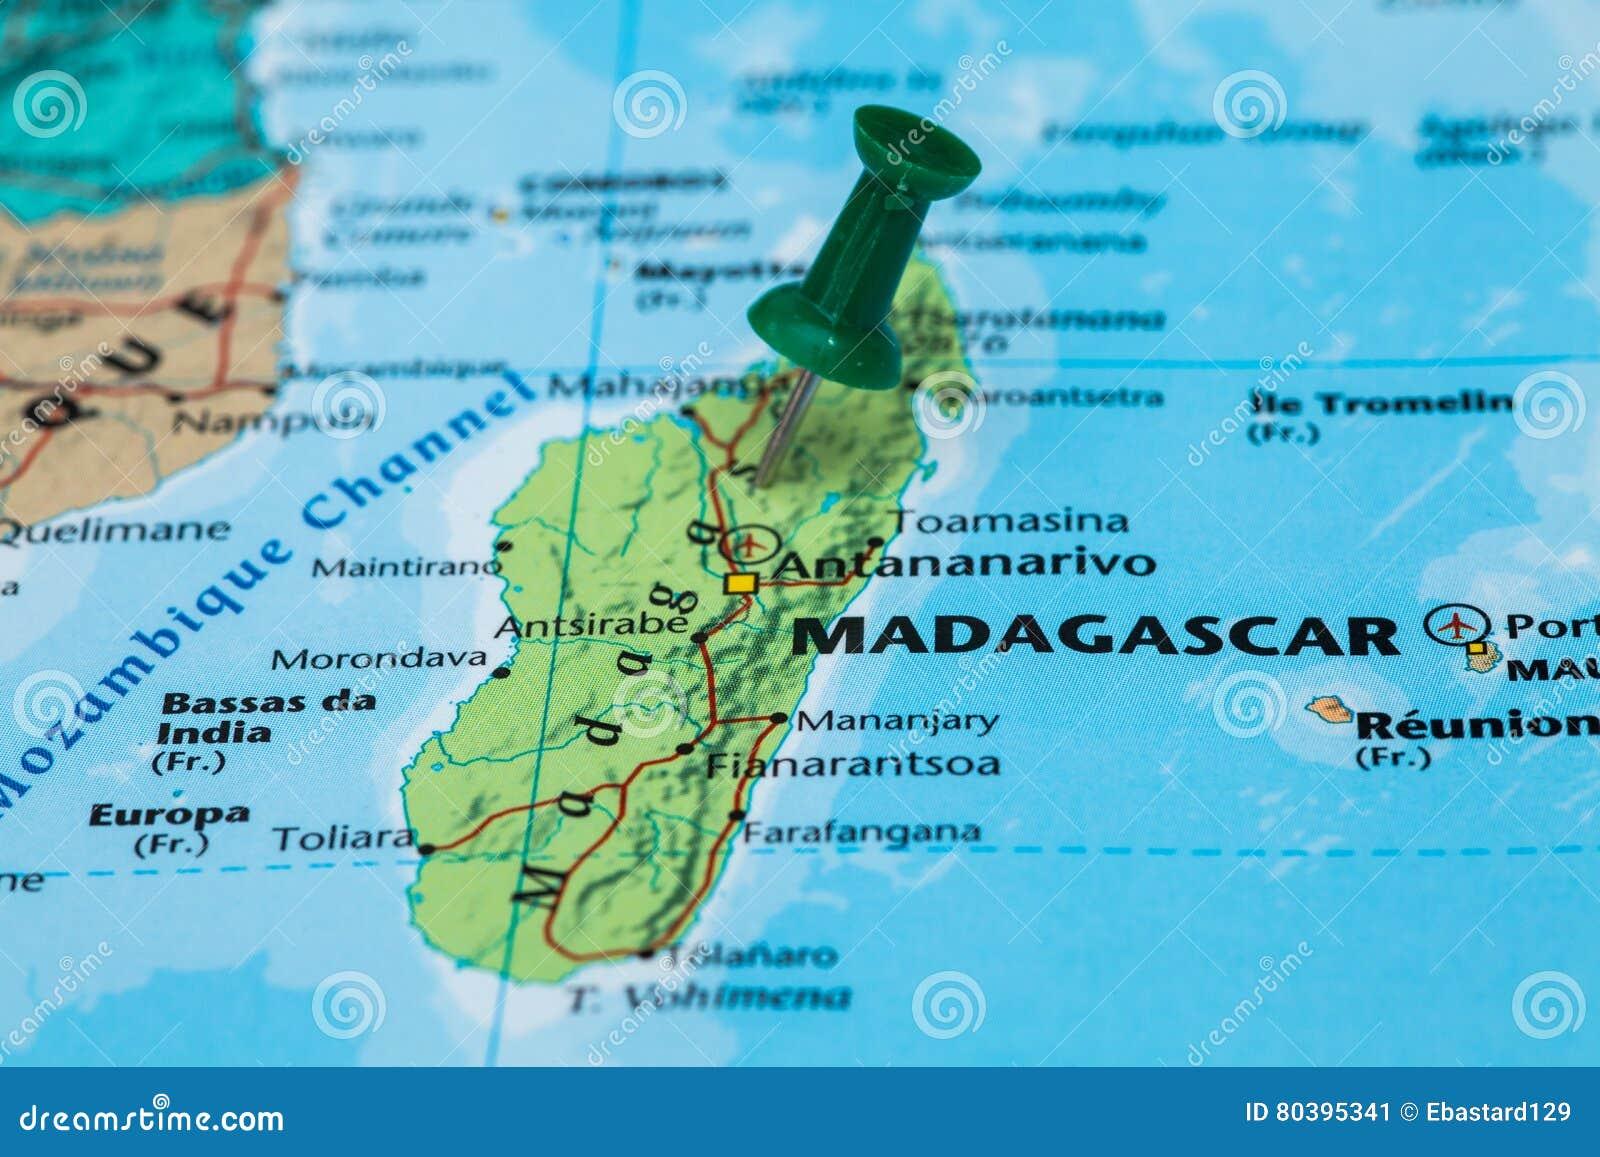 Carte Verte Madagascar.Carte Du Madagascar Avec Une Punaise Verte Coincee Image